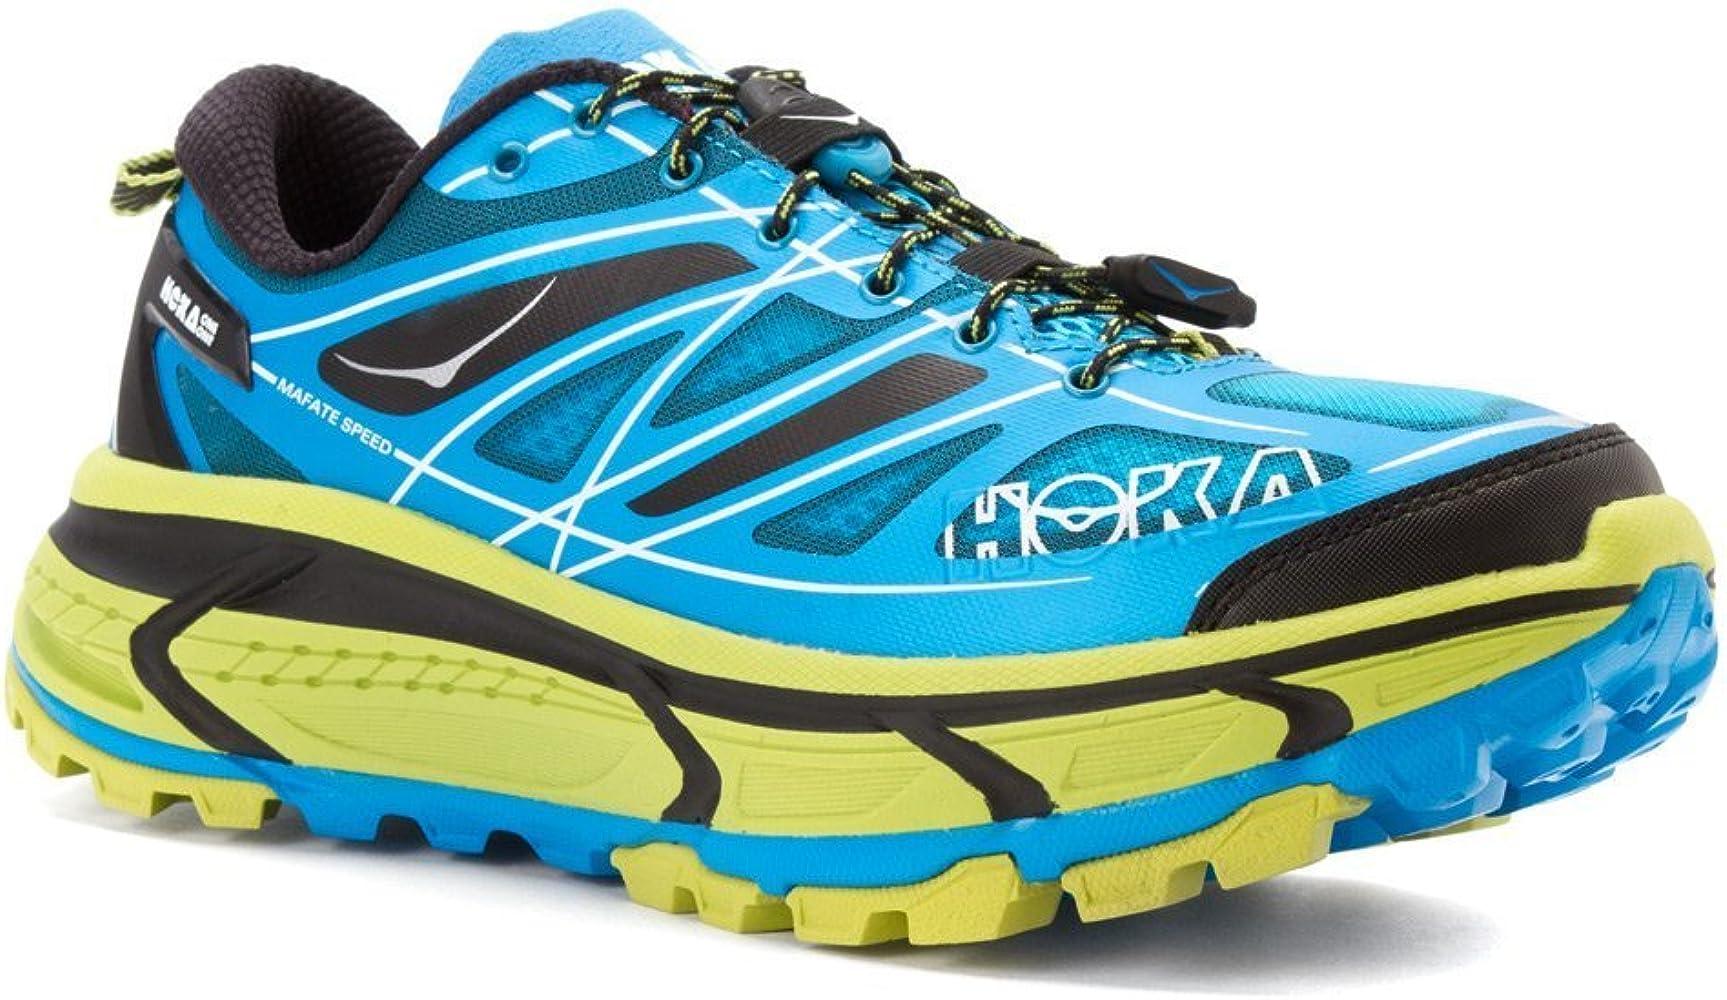 Hoka - HOKA - Chaussure Trail - MAFATE SPEED Bleu/Jaune - tailles: 43 1/3: Amazon.es: Deportes y aire libre